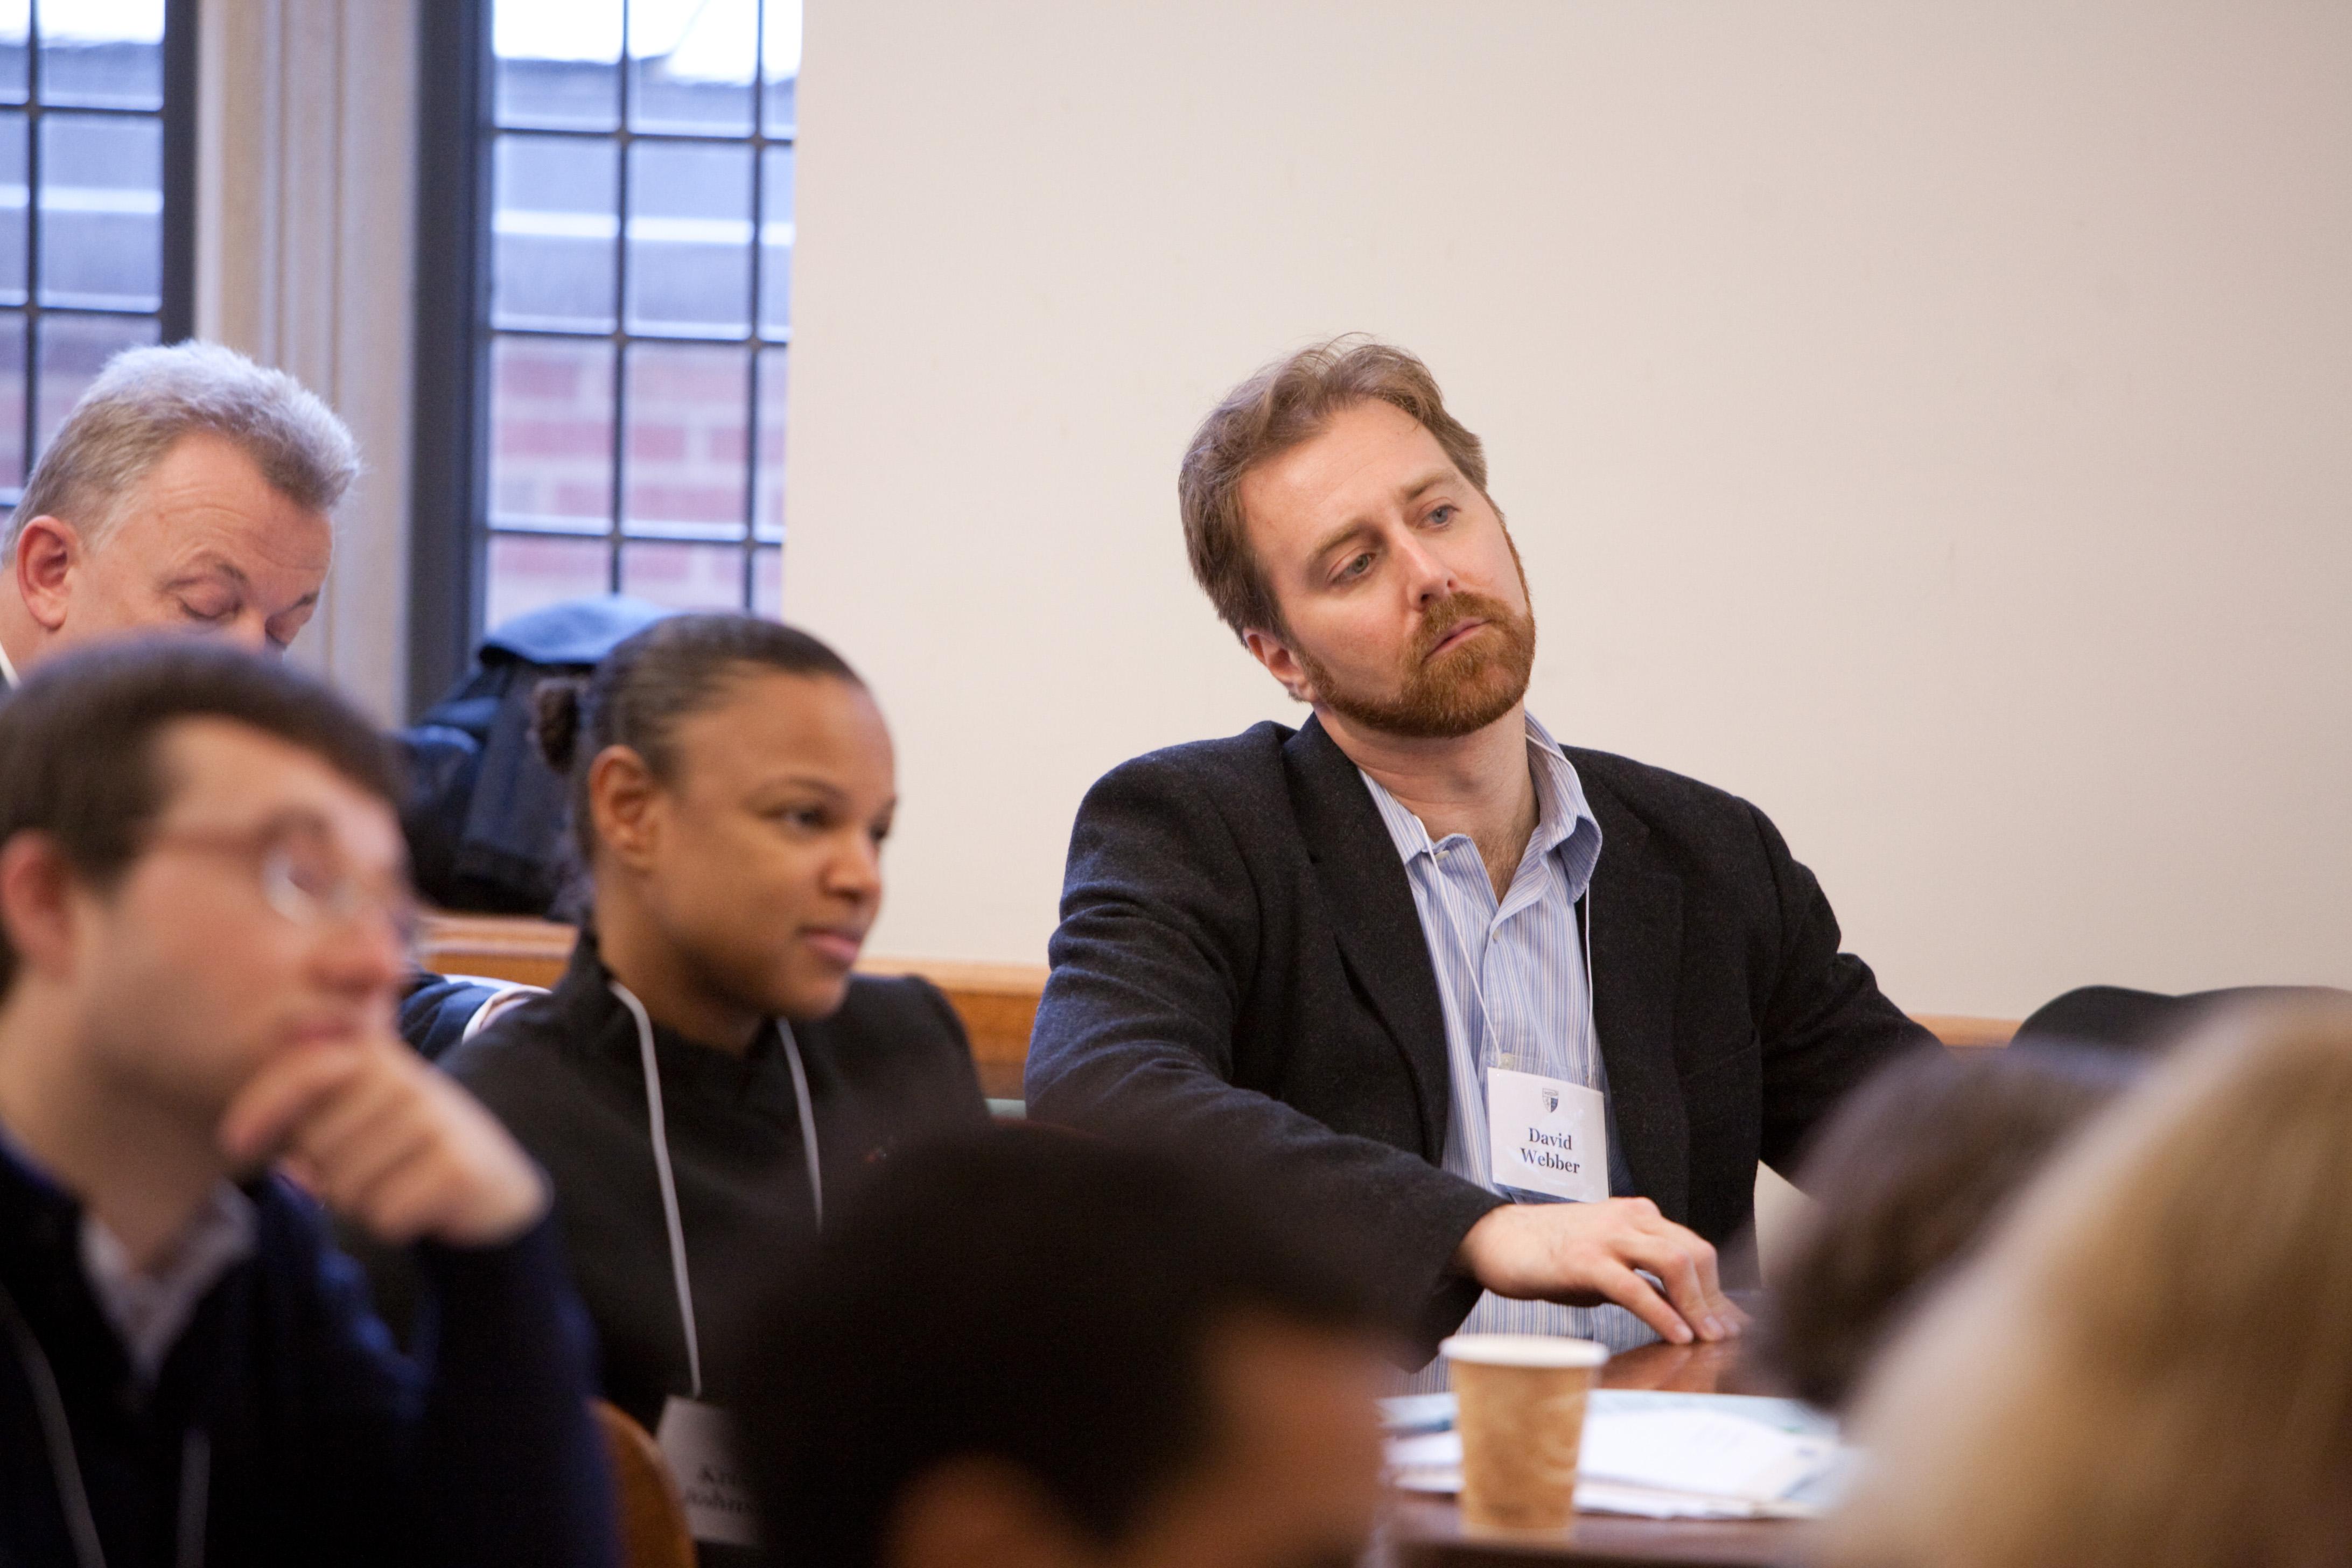 Seton Hall Law Prof. Kristin Johnson and Boston U. Law Prof. David Webber